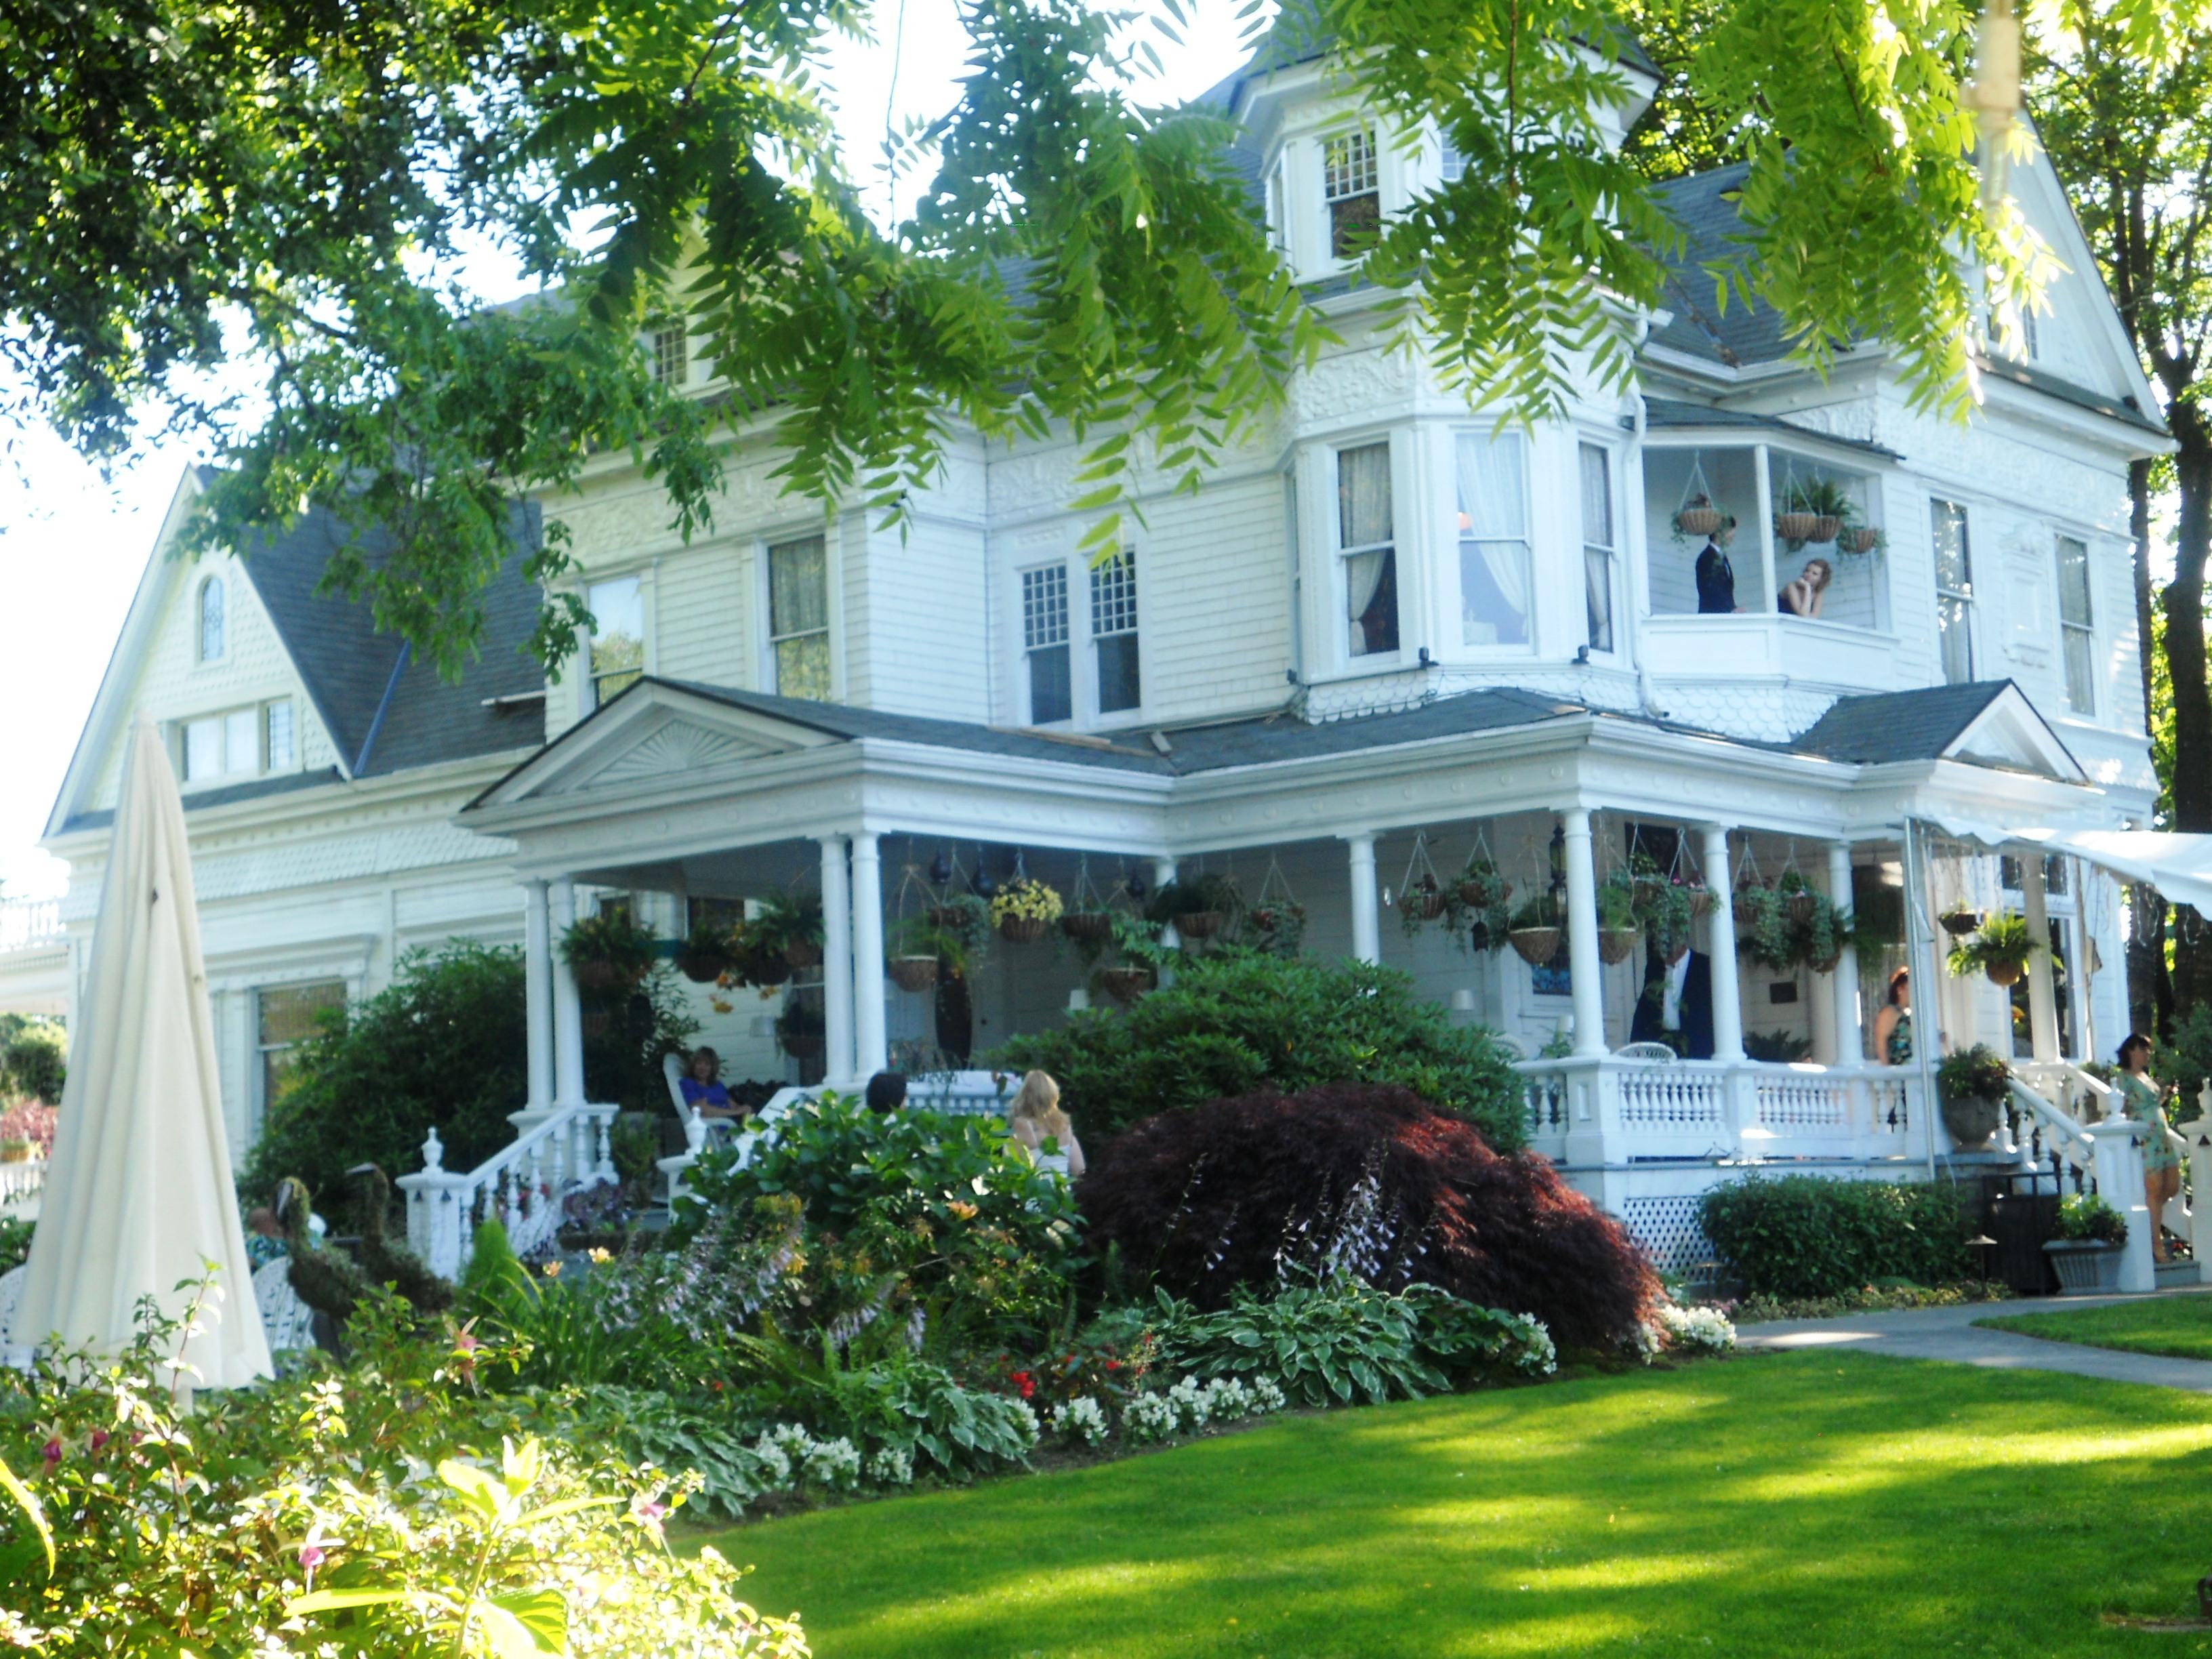 Queen anne victorian mansion a festive heart for Queen anne victorian